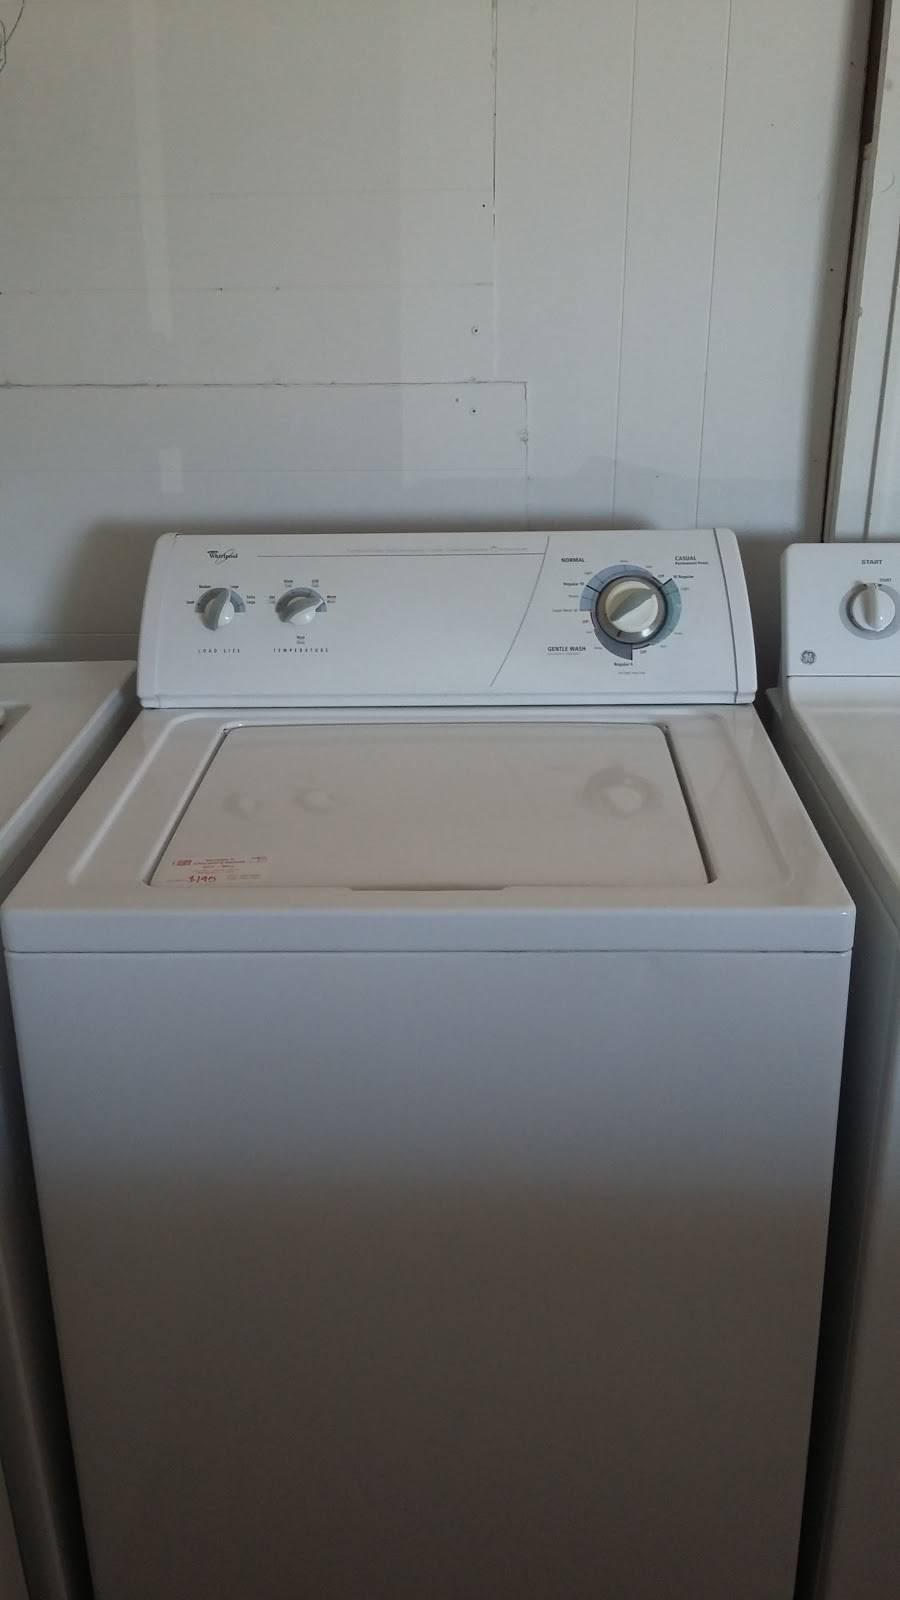 michael's appliances - home goods store  | Photo 3 of 5 | Address: 2214 Nogalitos St, San Antonio, TX 78225, USA | Phone: (210) 789-1483